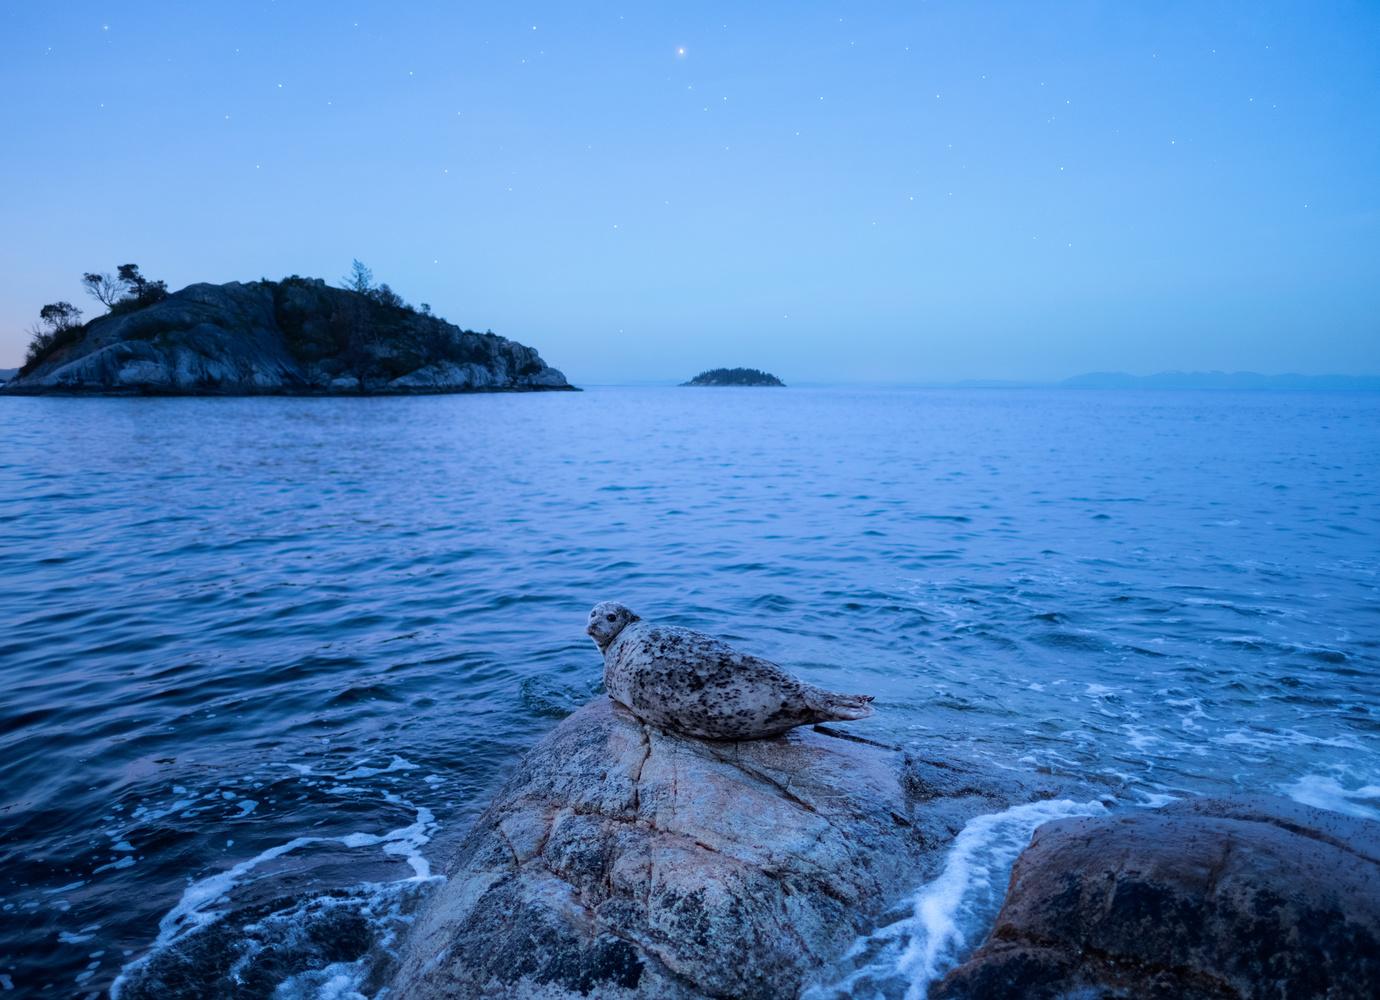 Blue Hour by Jaspreet Sidhu